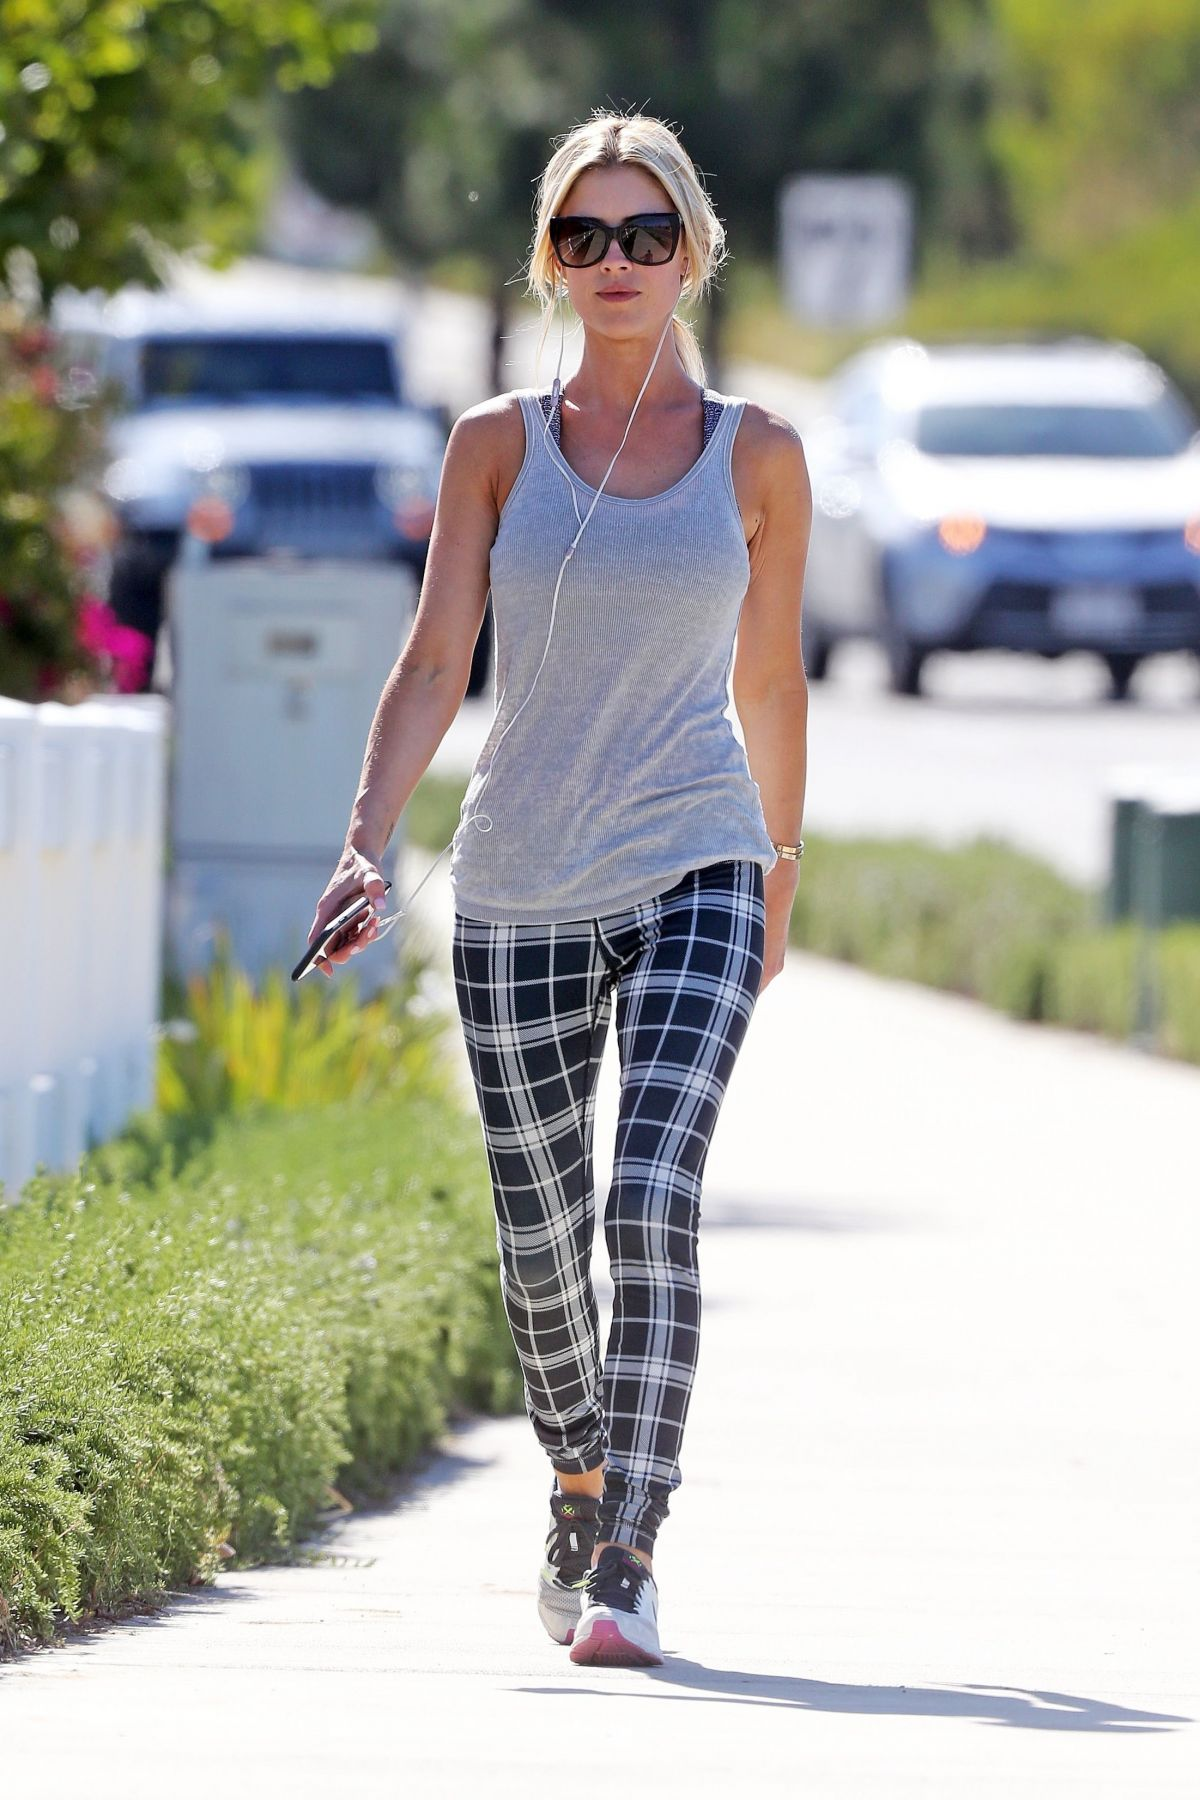 christina el moussa out jogging in orange county 06 13 2017